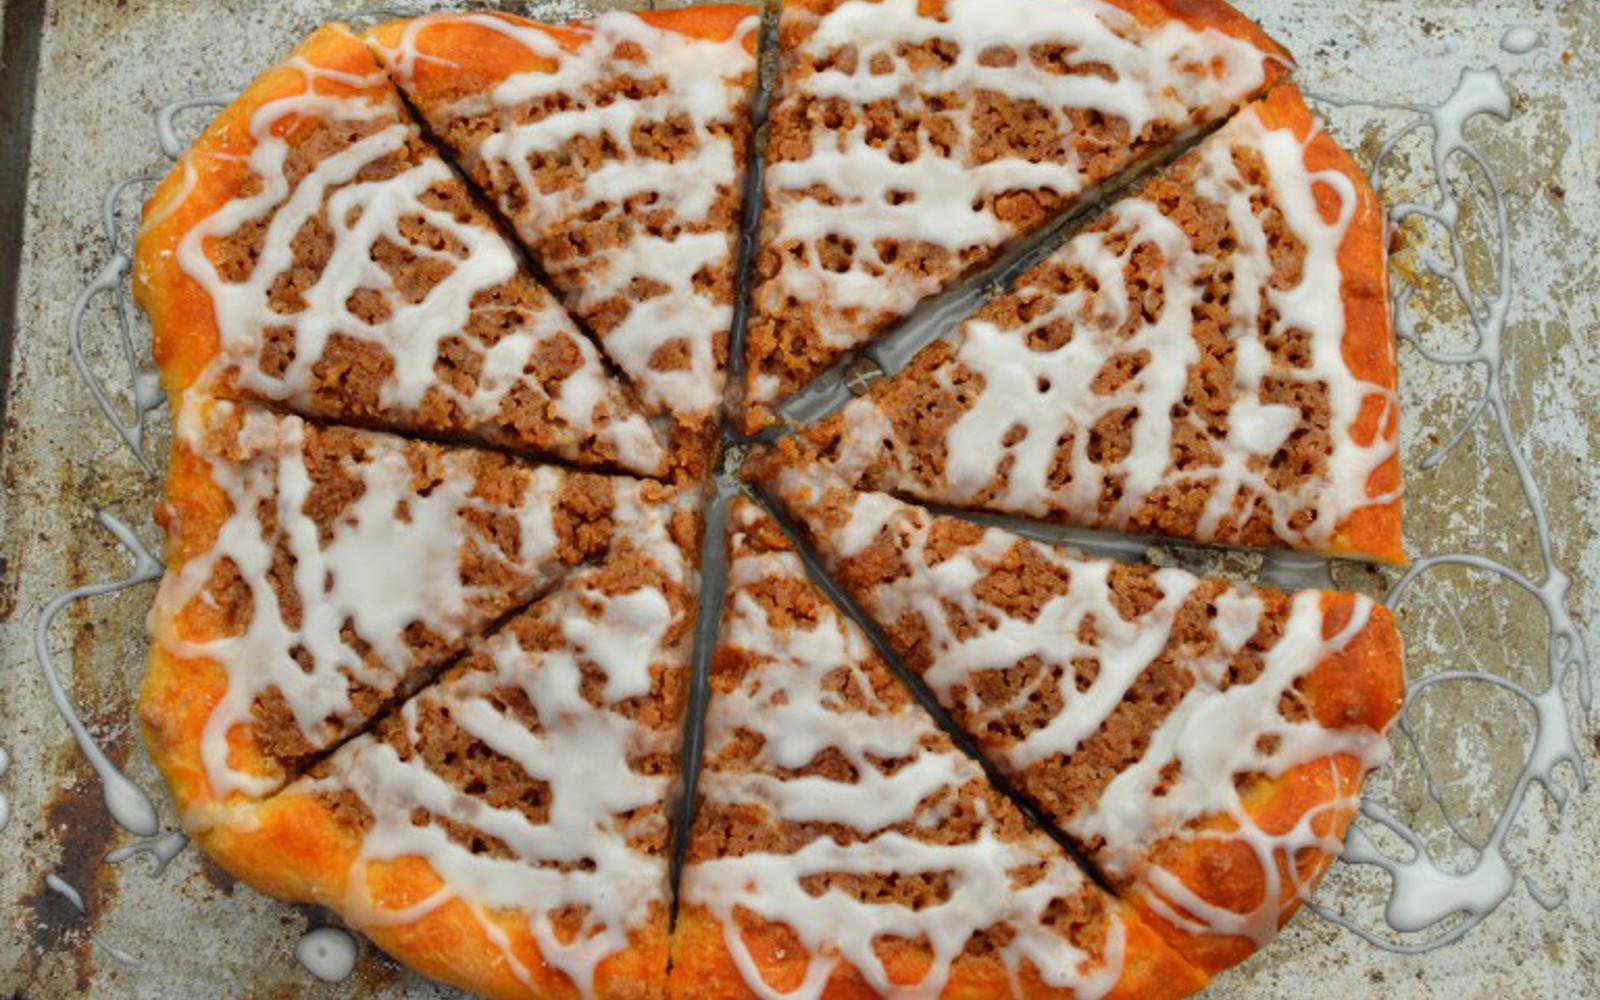 Vegan Cinnamon Crumb Dessert Pizza